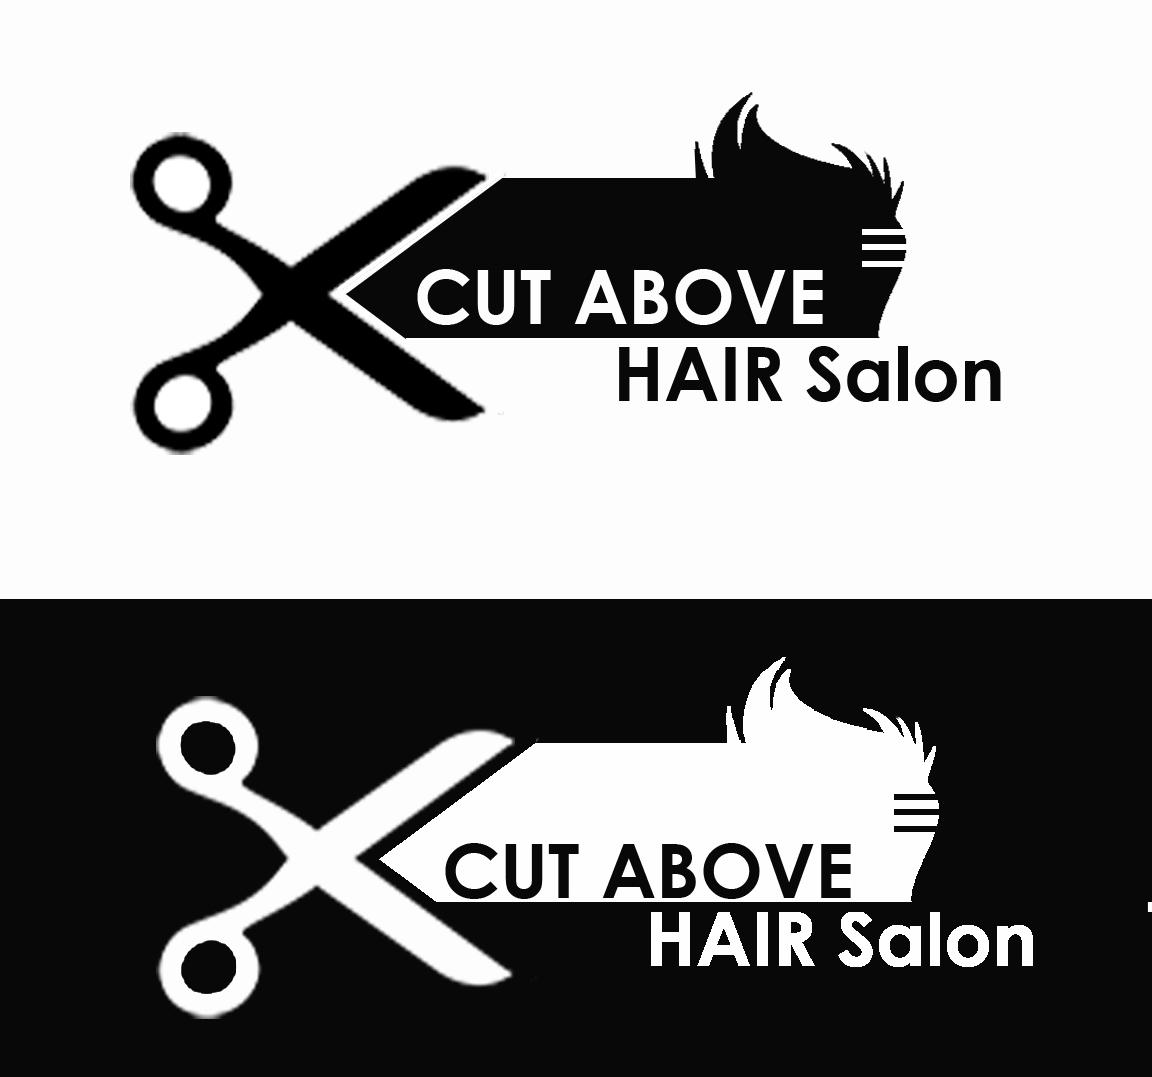 Modern Masculine Hair And Beauty Logo Design For Cut Above Salon By Mushroom Eggegg Design 15510225